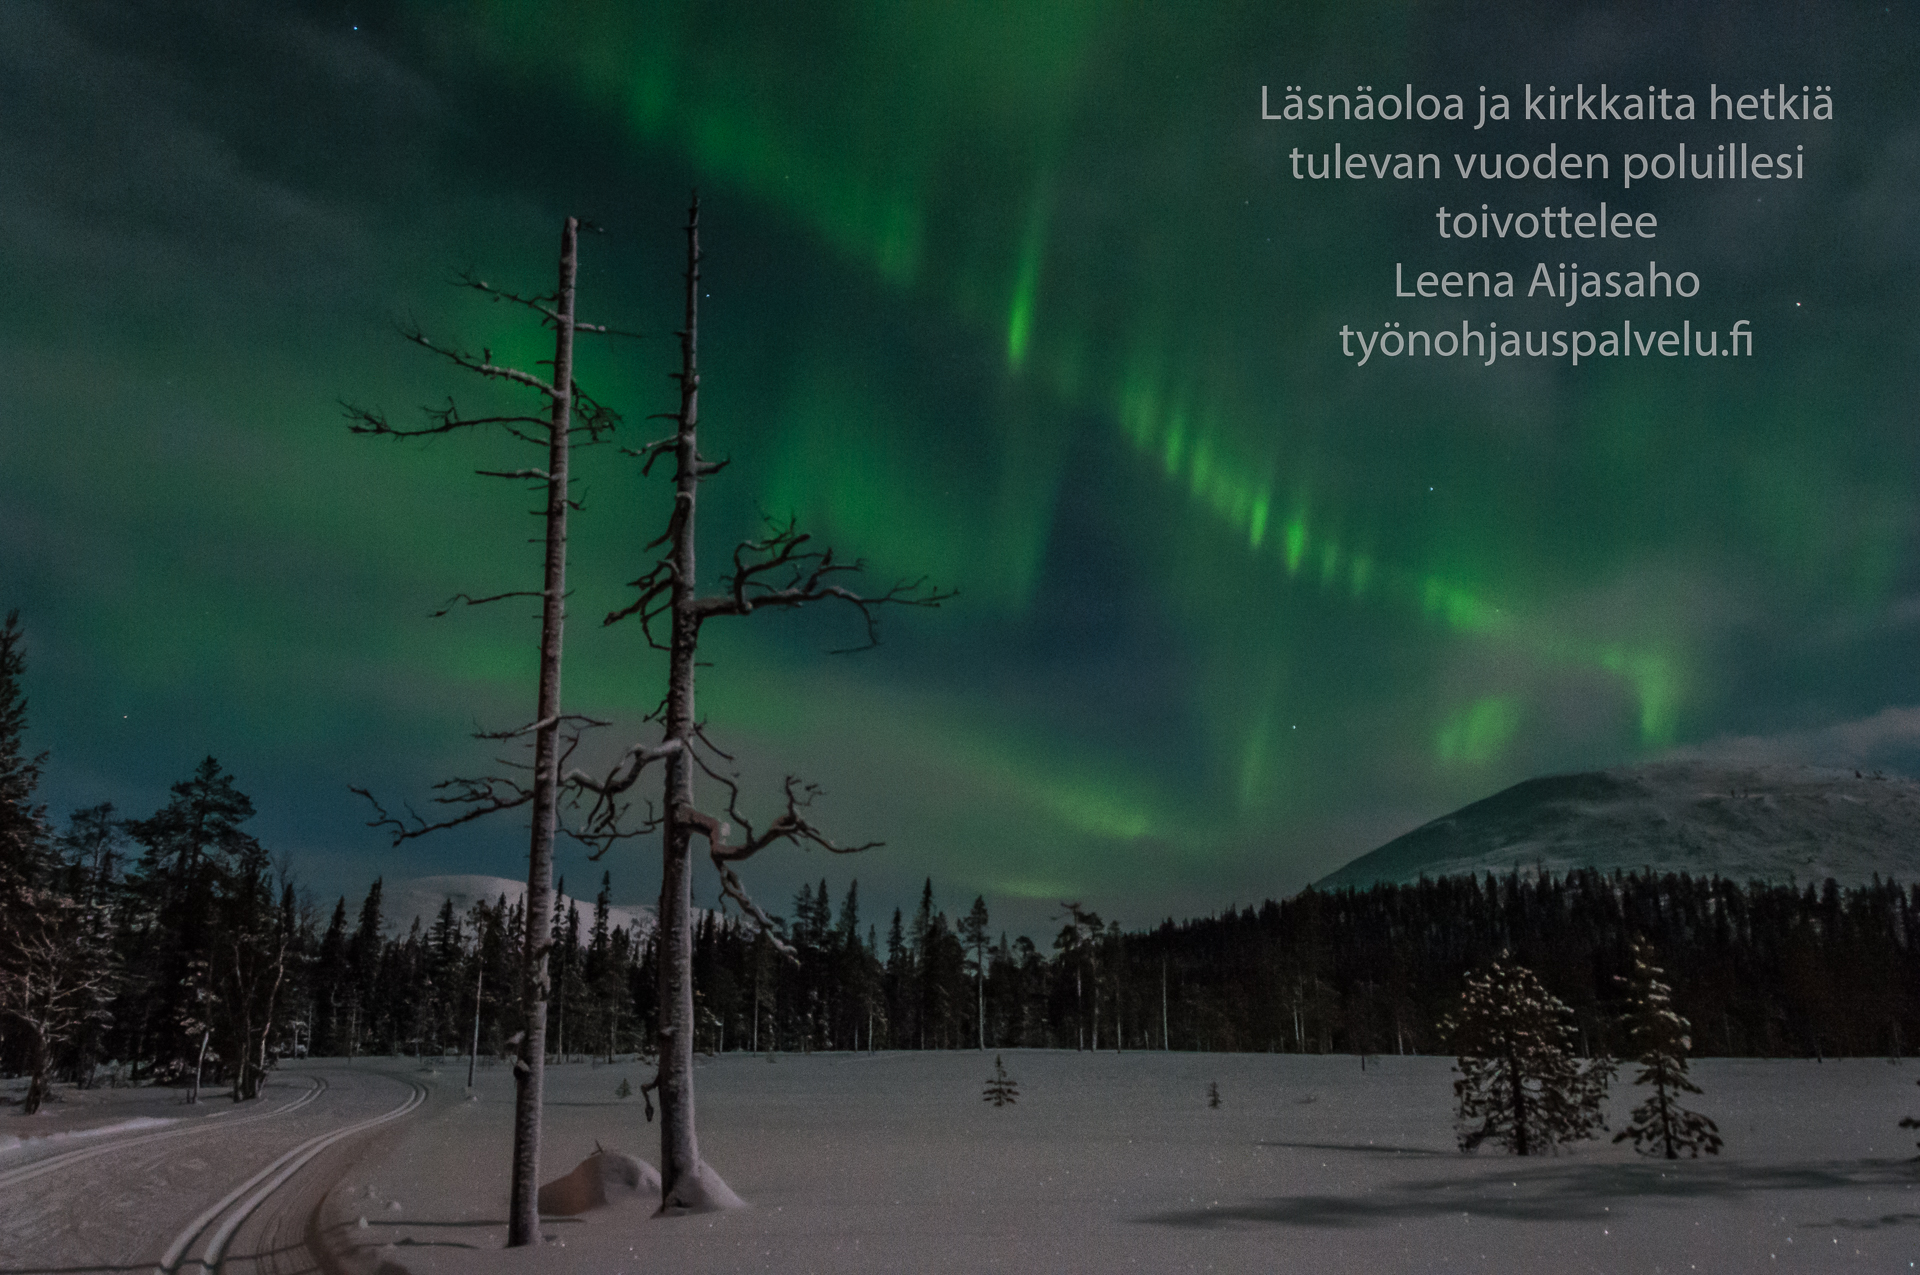 Revontulet joulu 2015 Leena Aijasaho